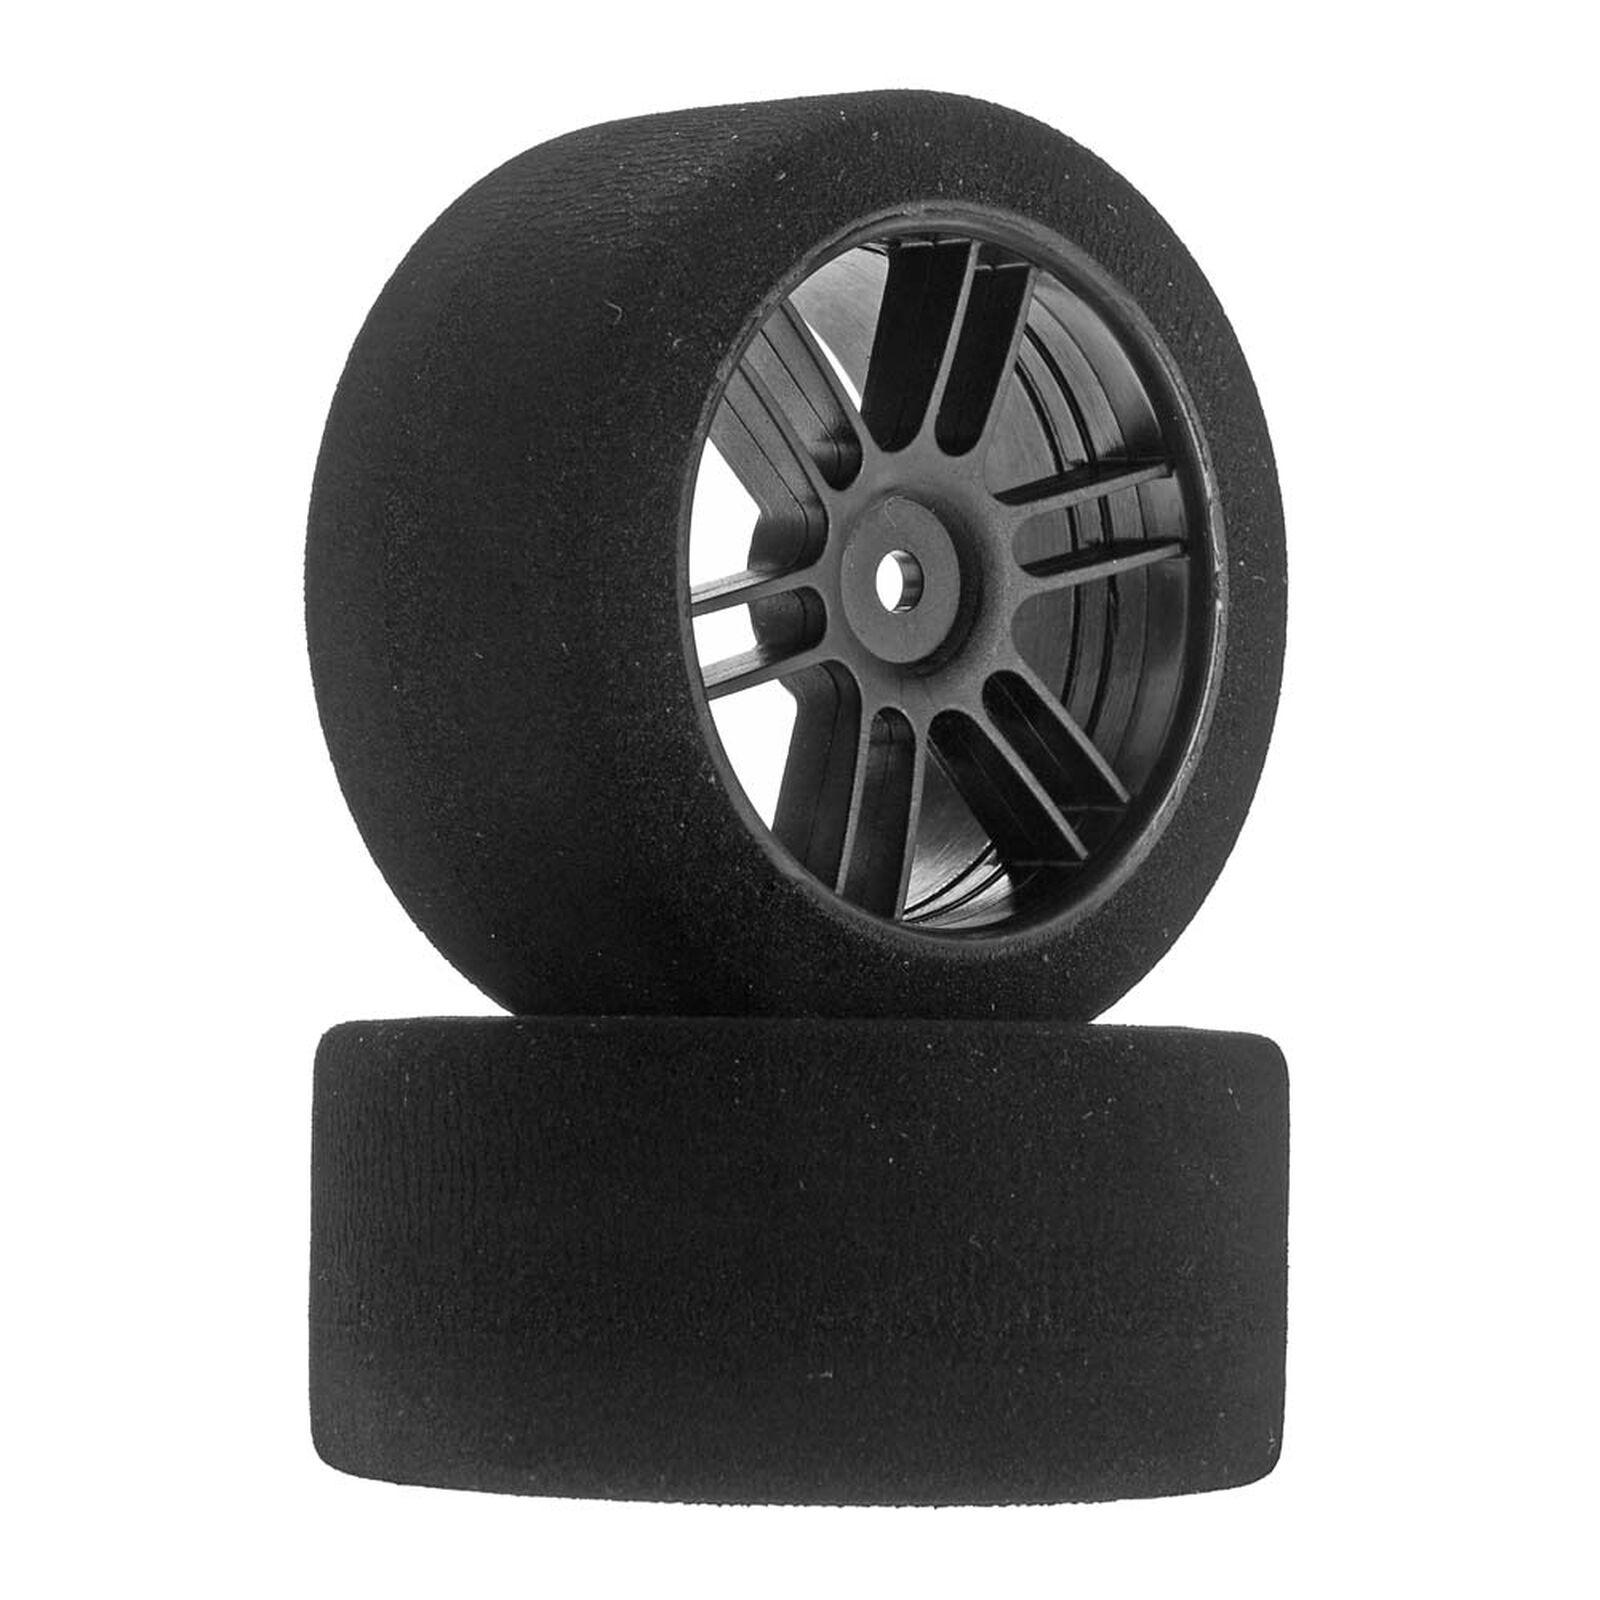 1/10 30mm Nitro Touring Foam Tires, Mounted, 38 Rear, Black Wheels (2)